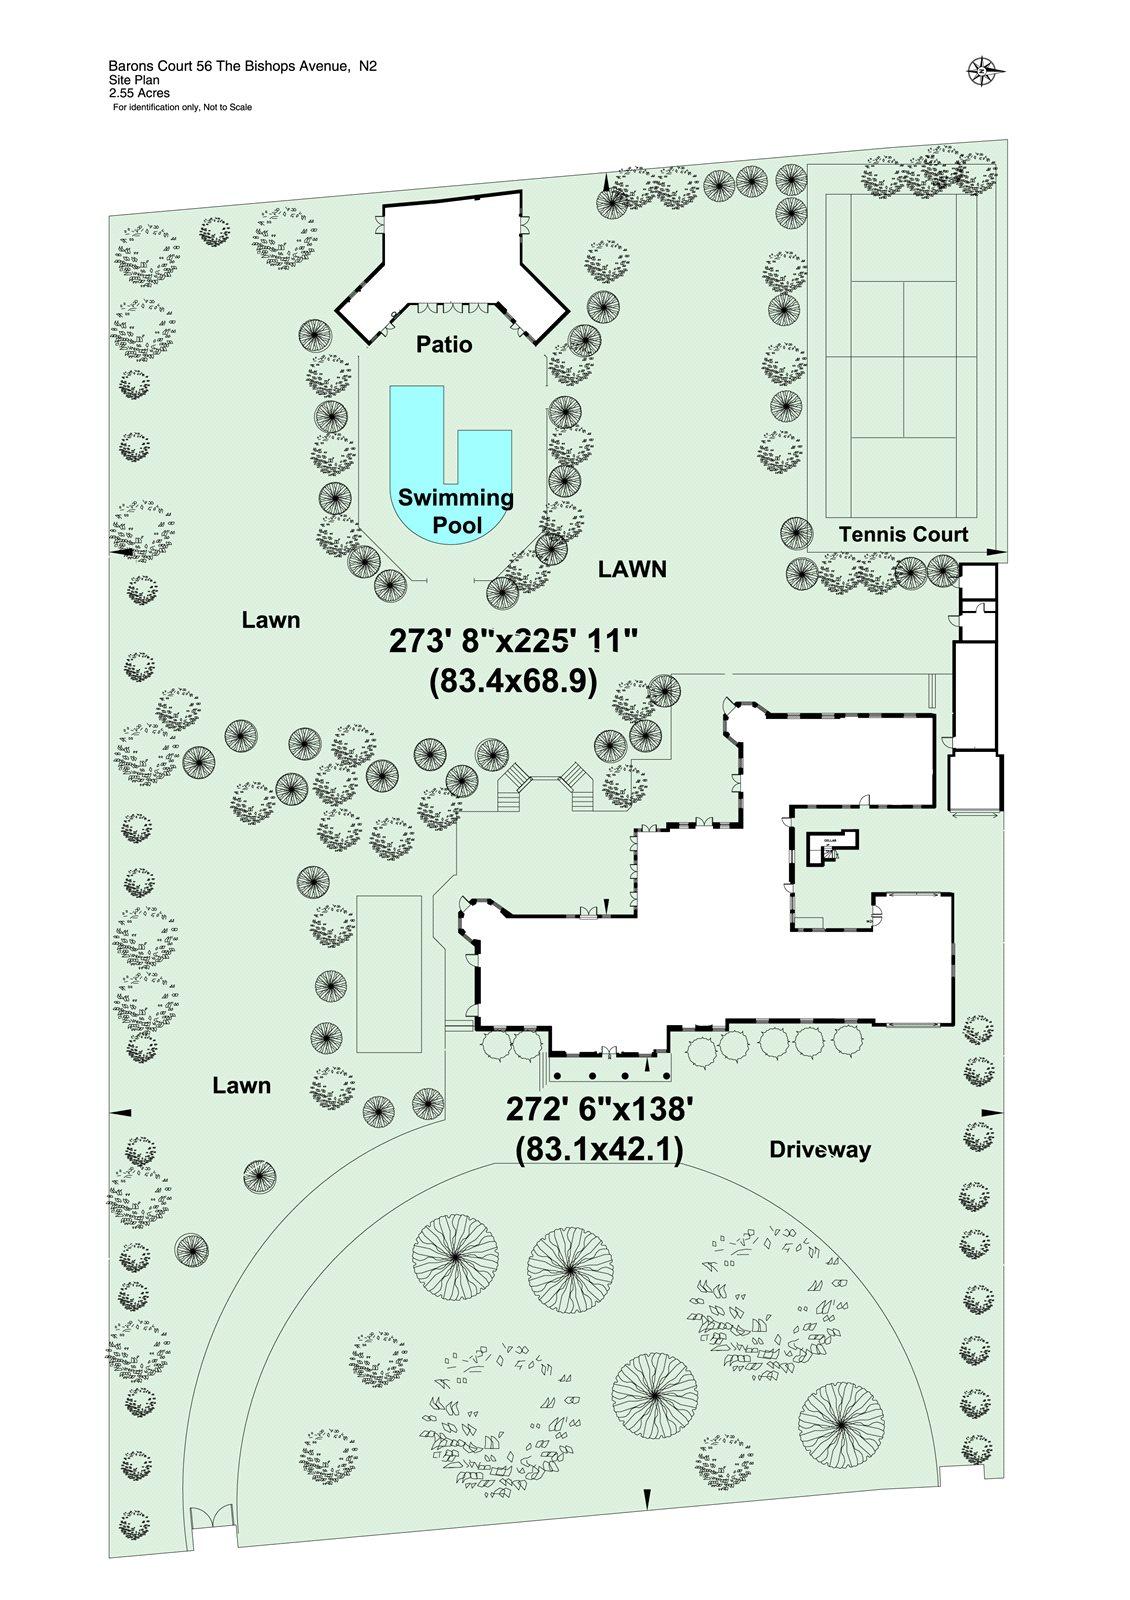 Floorplan 2 of 3: Picture No. 14